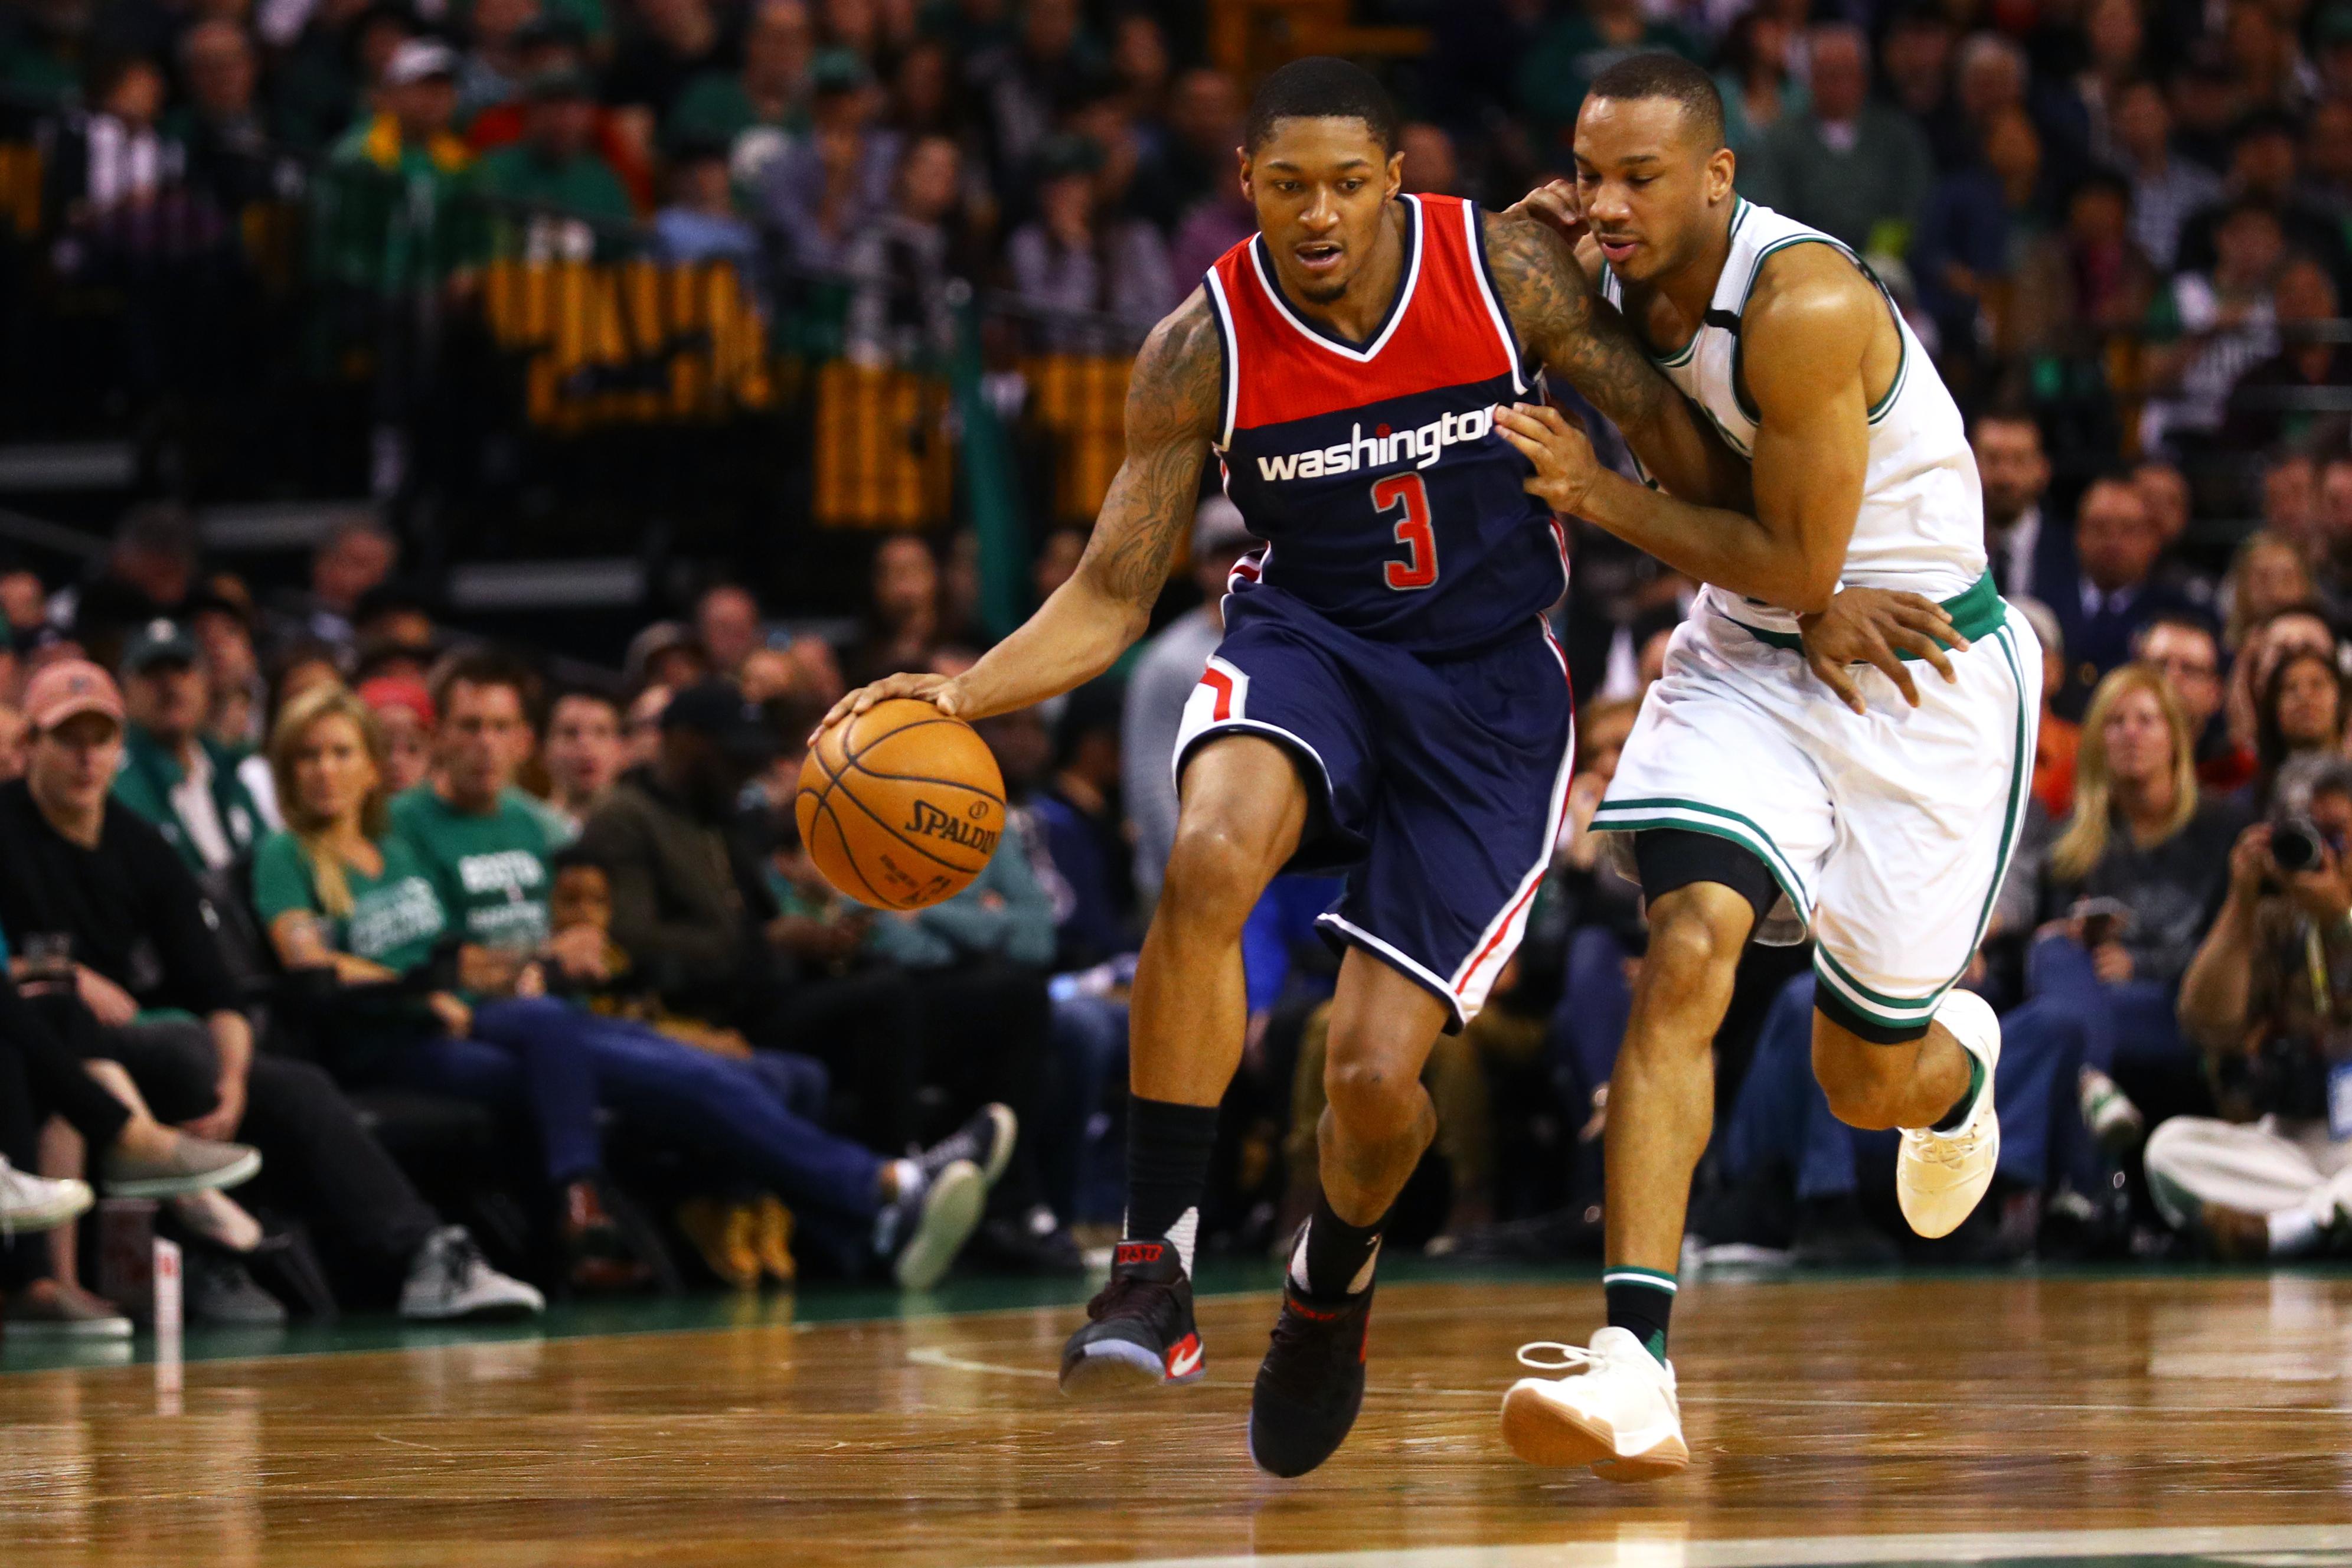 Enemy Chatter: Scott Brooks thinks the Celtics are manhandling Bradley Beal